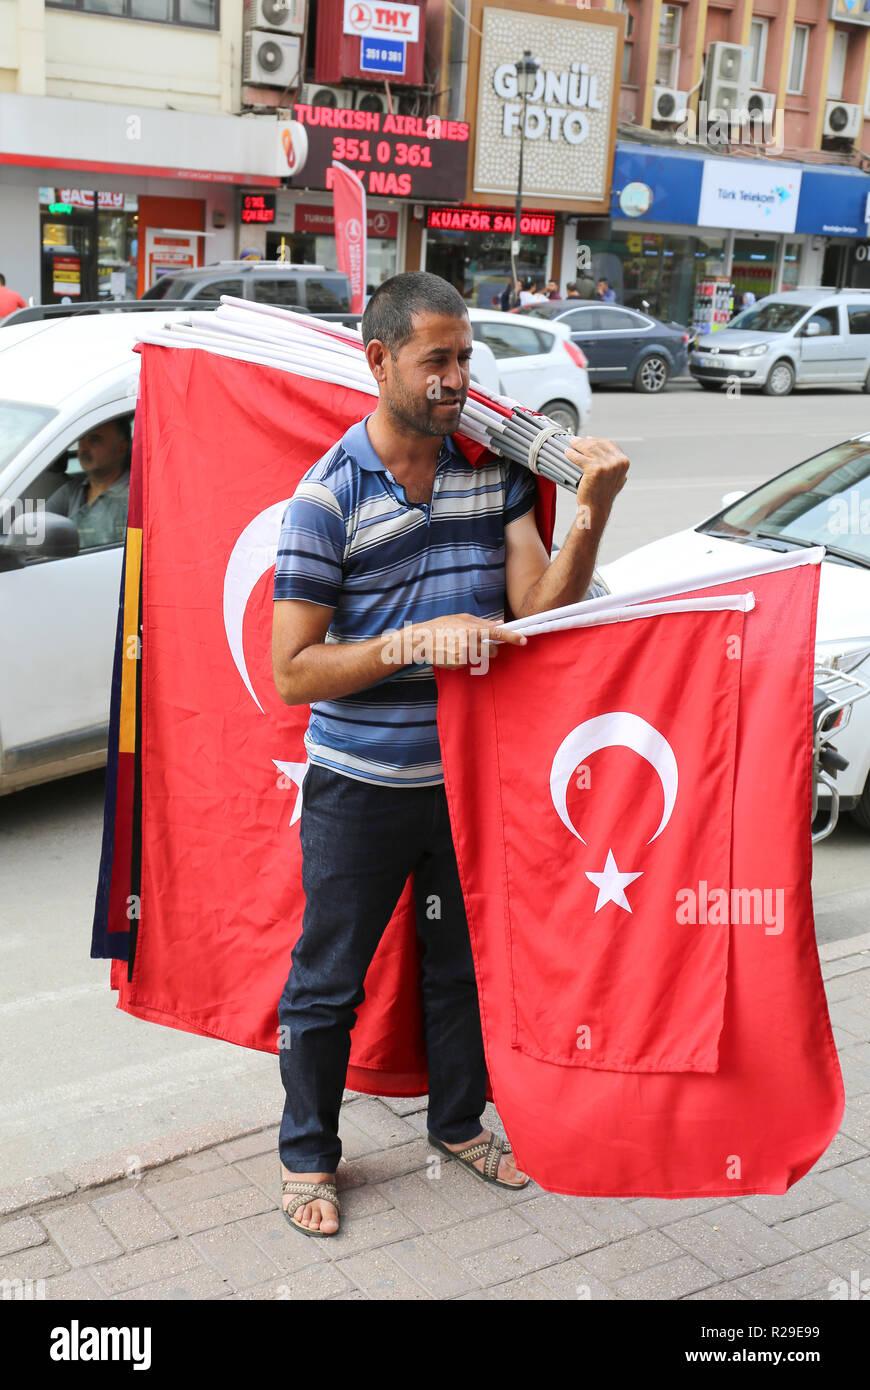 ADANA,TURKEY-OCTOBER 23:Unidentified Man selling Turkish Flags on street.October 23,2018 in Adana,Turkey. - Stock Image